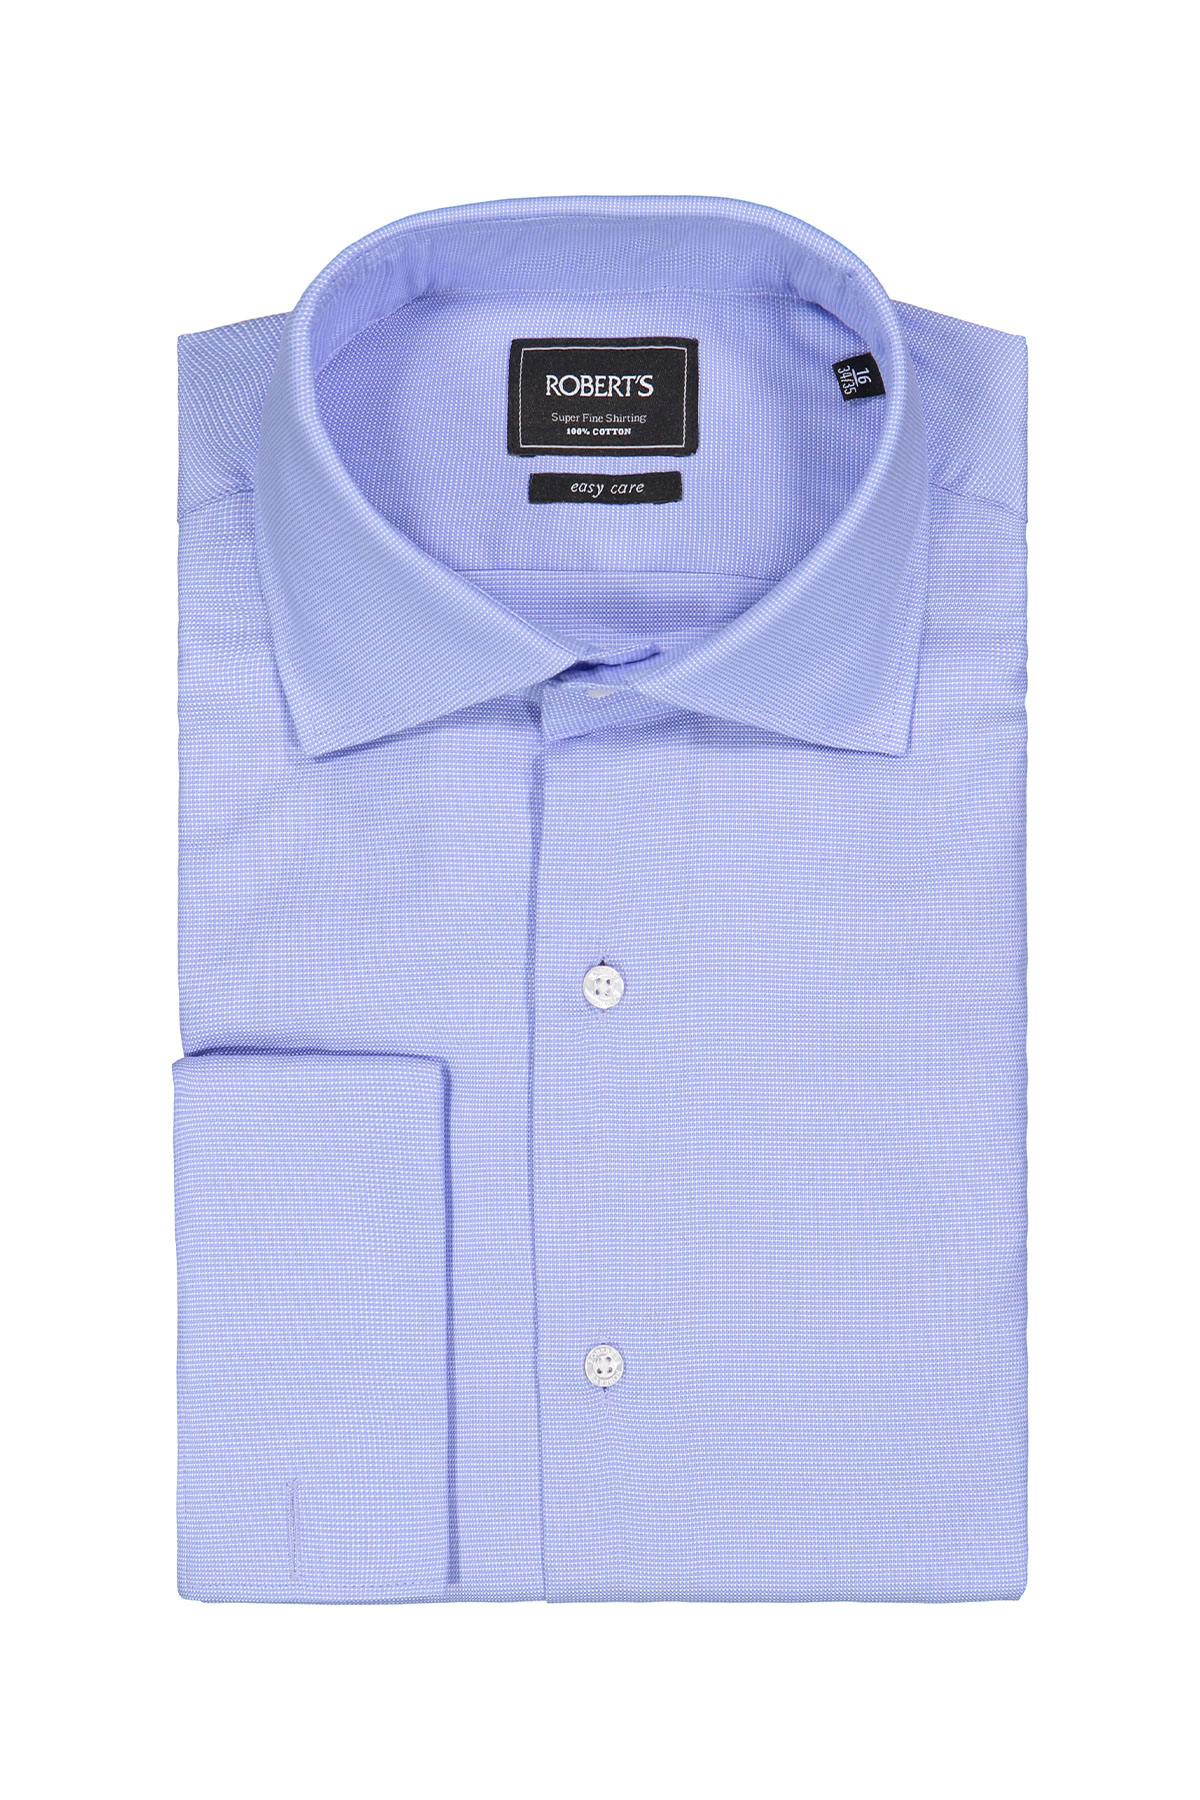 Camisa Robert´s, Easy Care, celeste micro diseño, puño doble.